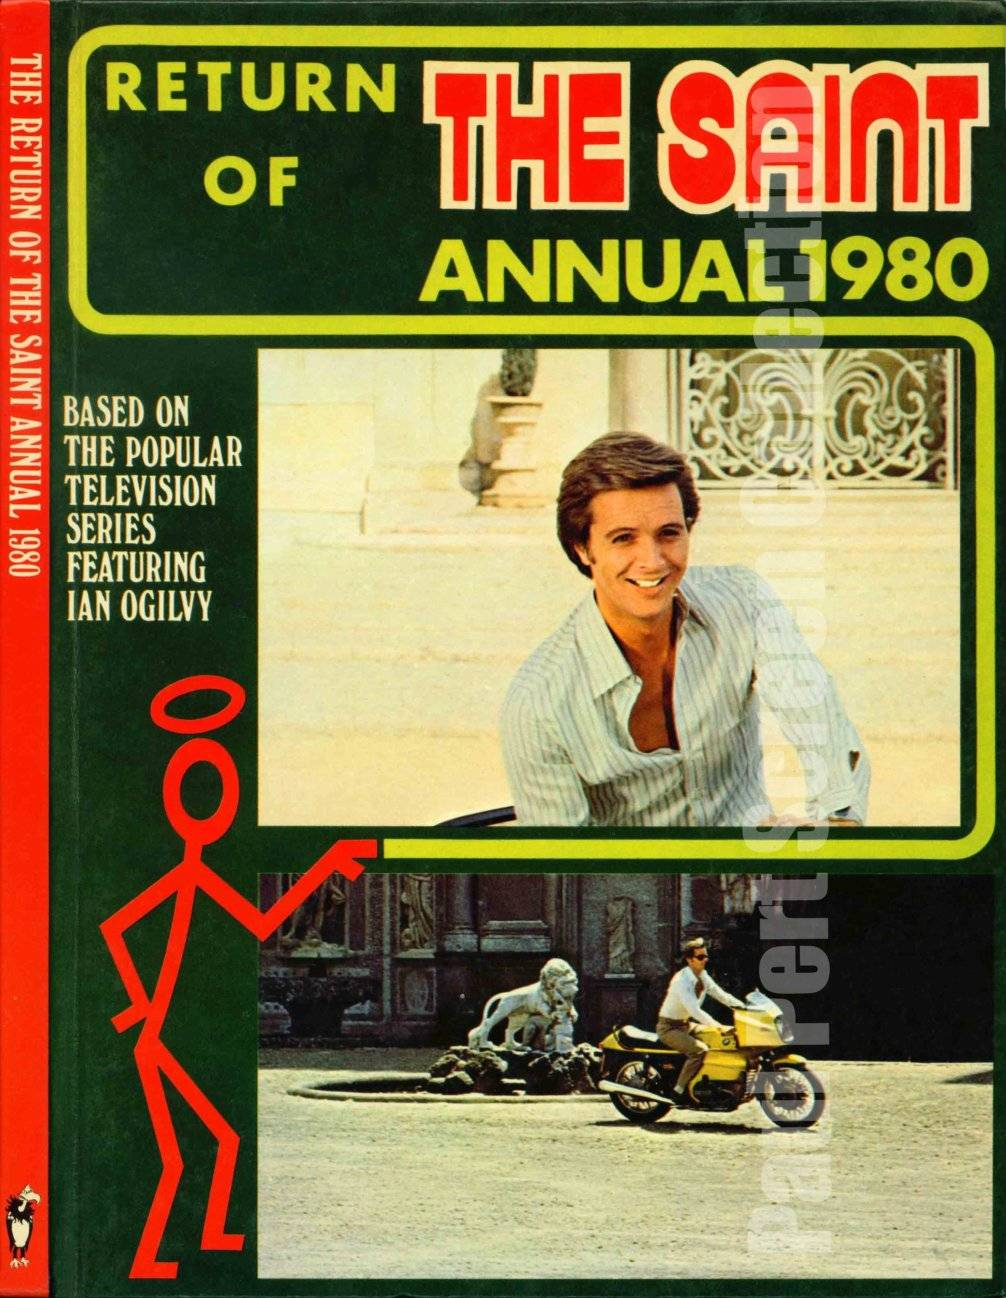 The Return of the Saint - Annual 1980